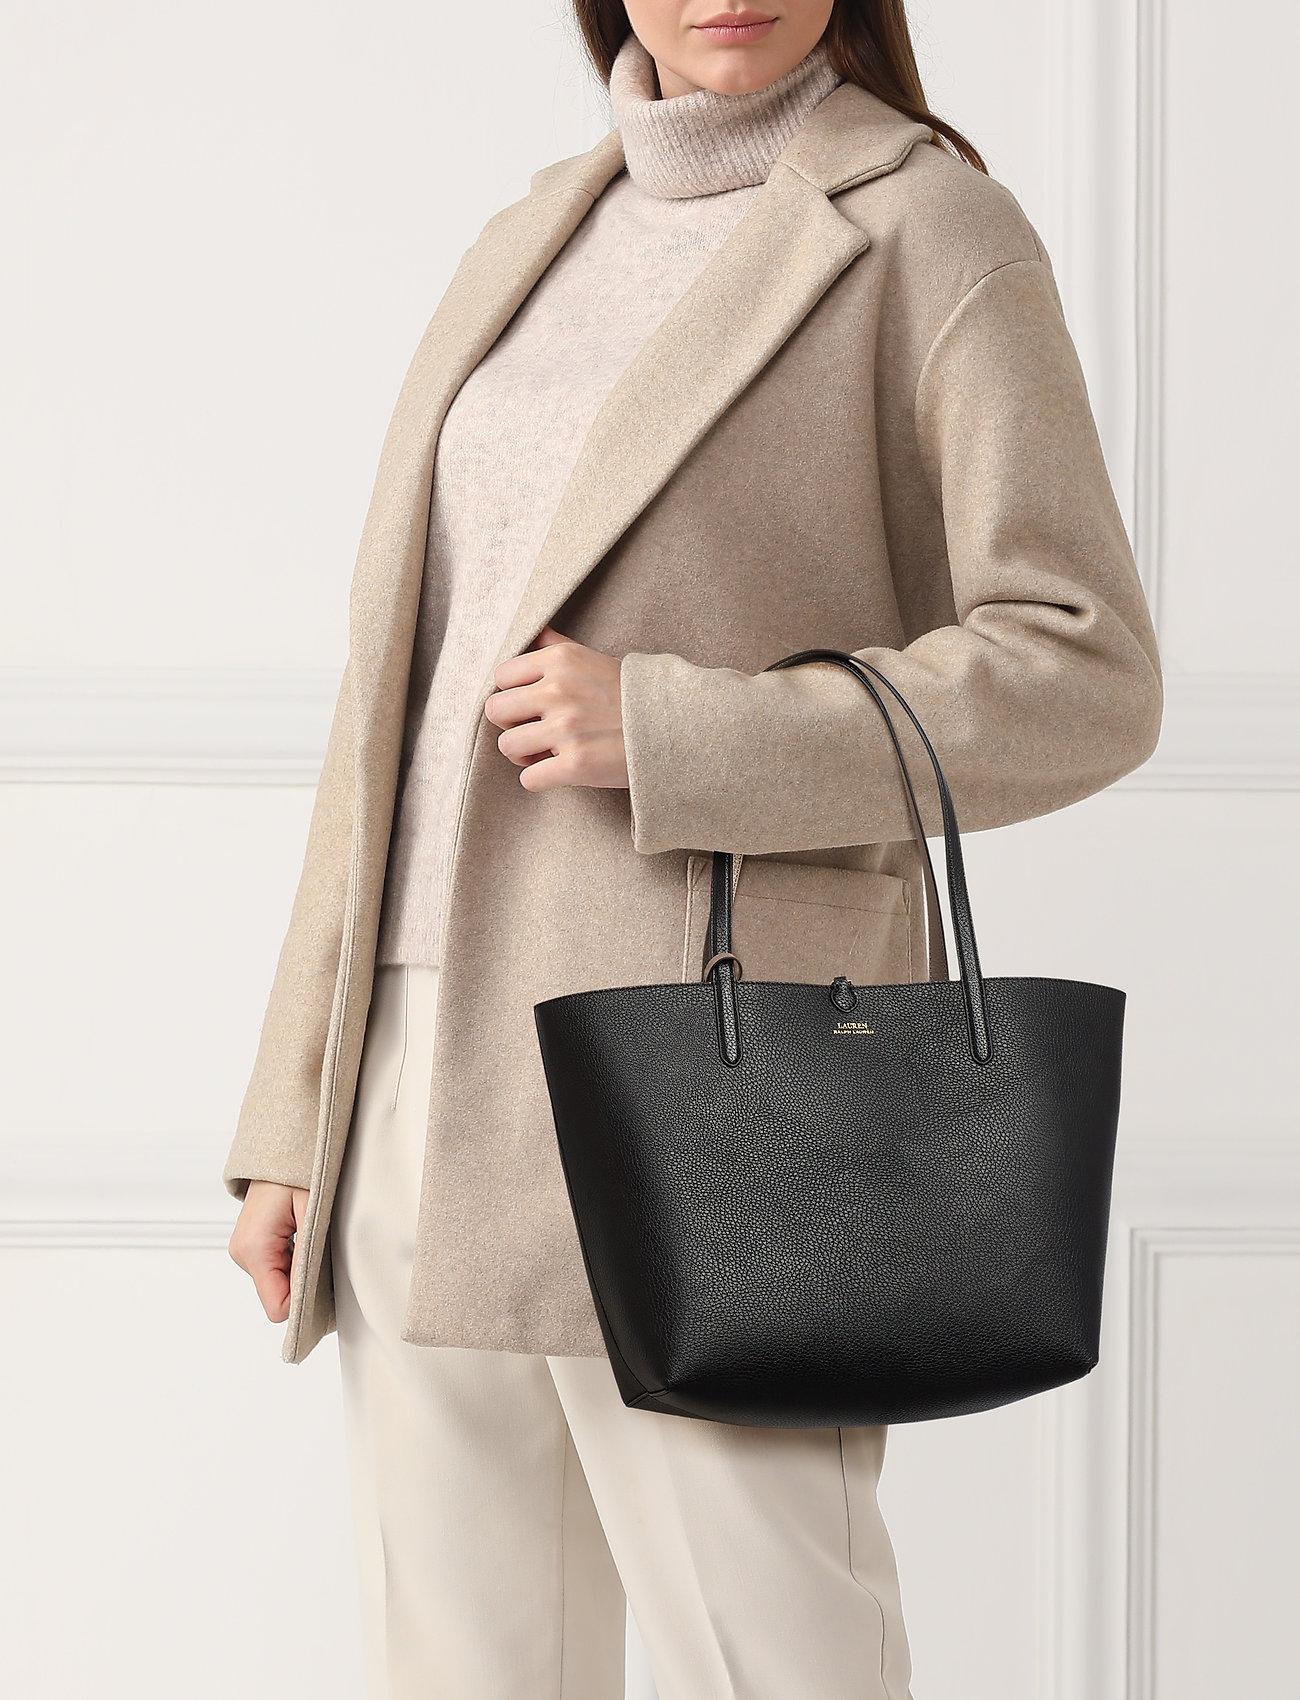 Lauren Ralph Lauren Faux-Leather Reversible Tote - BLACK/TAUPE